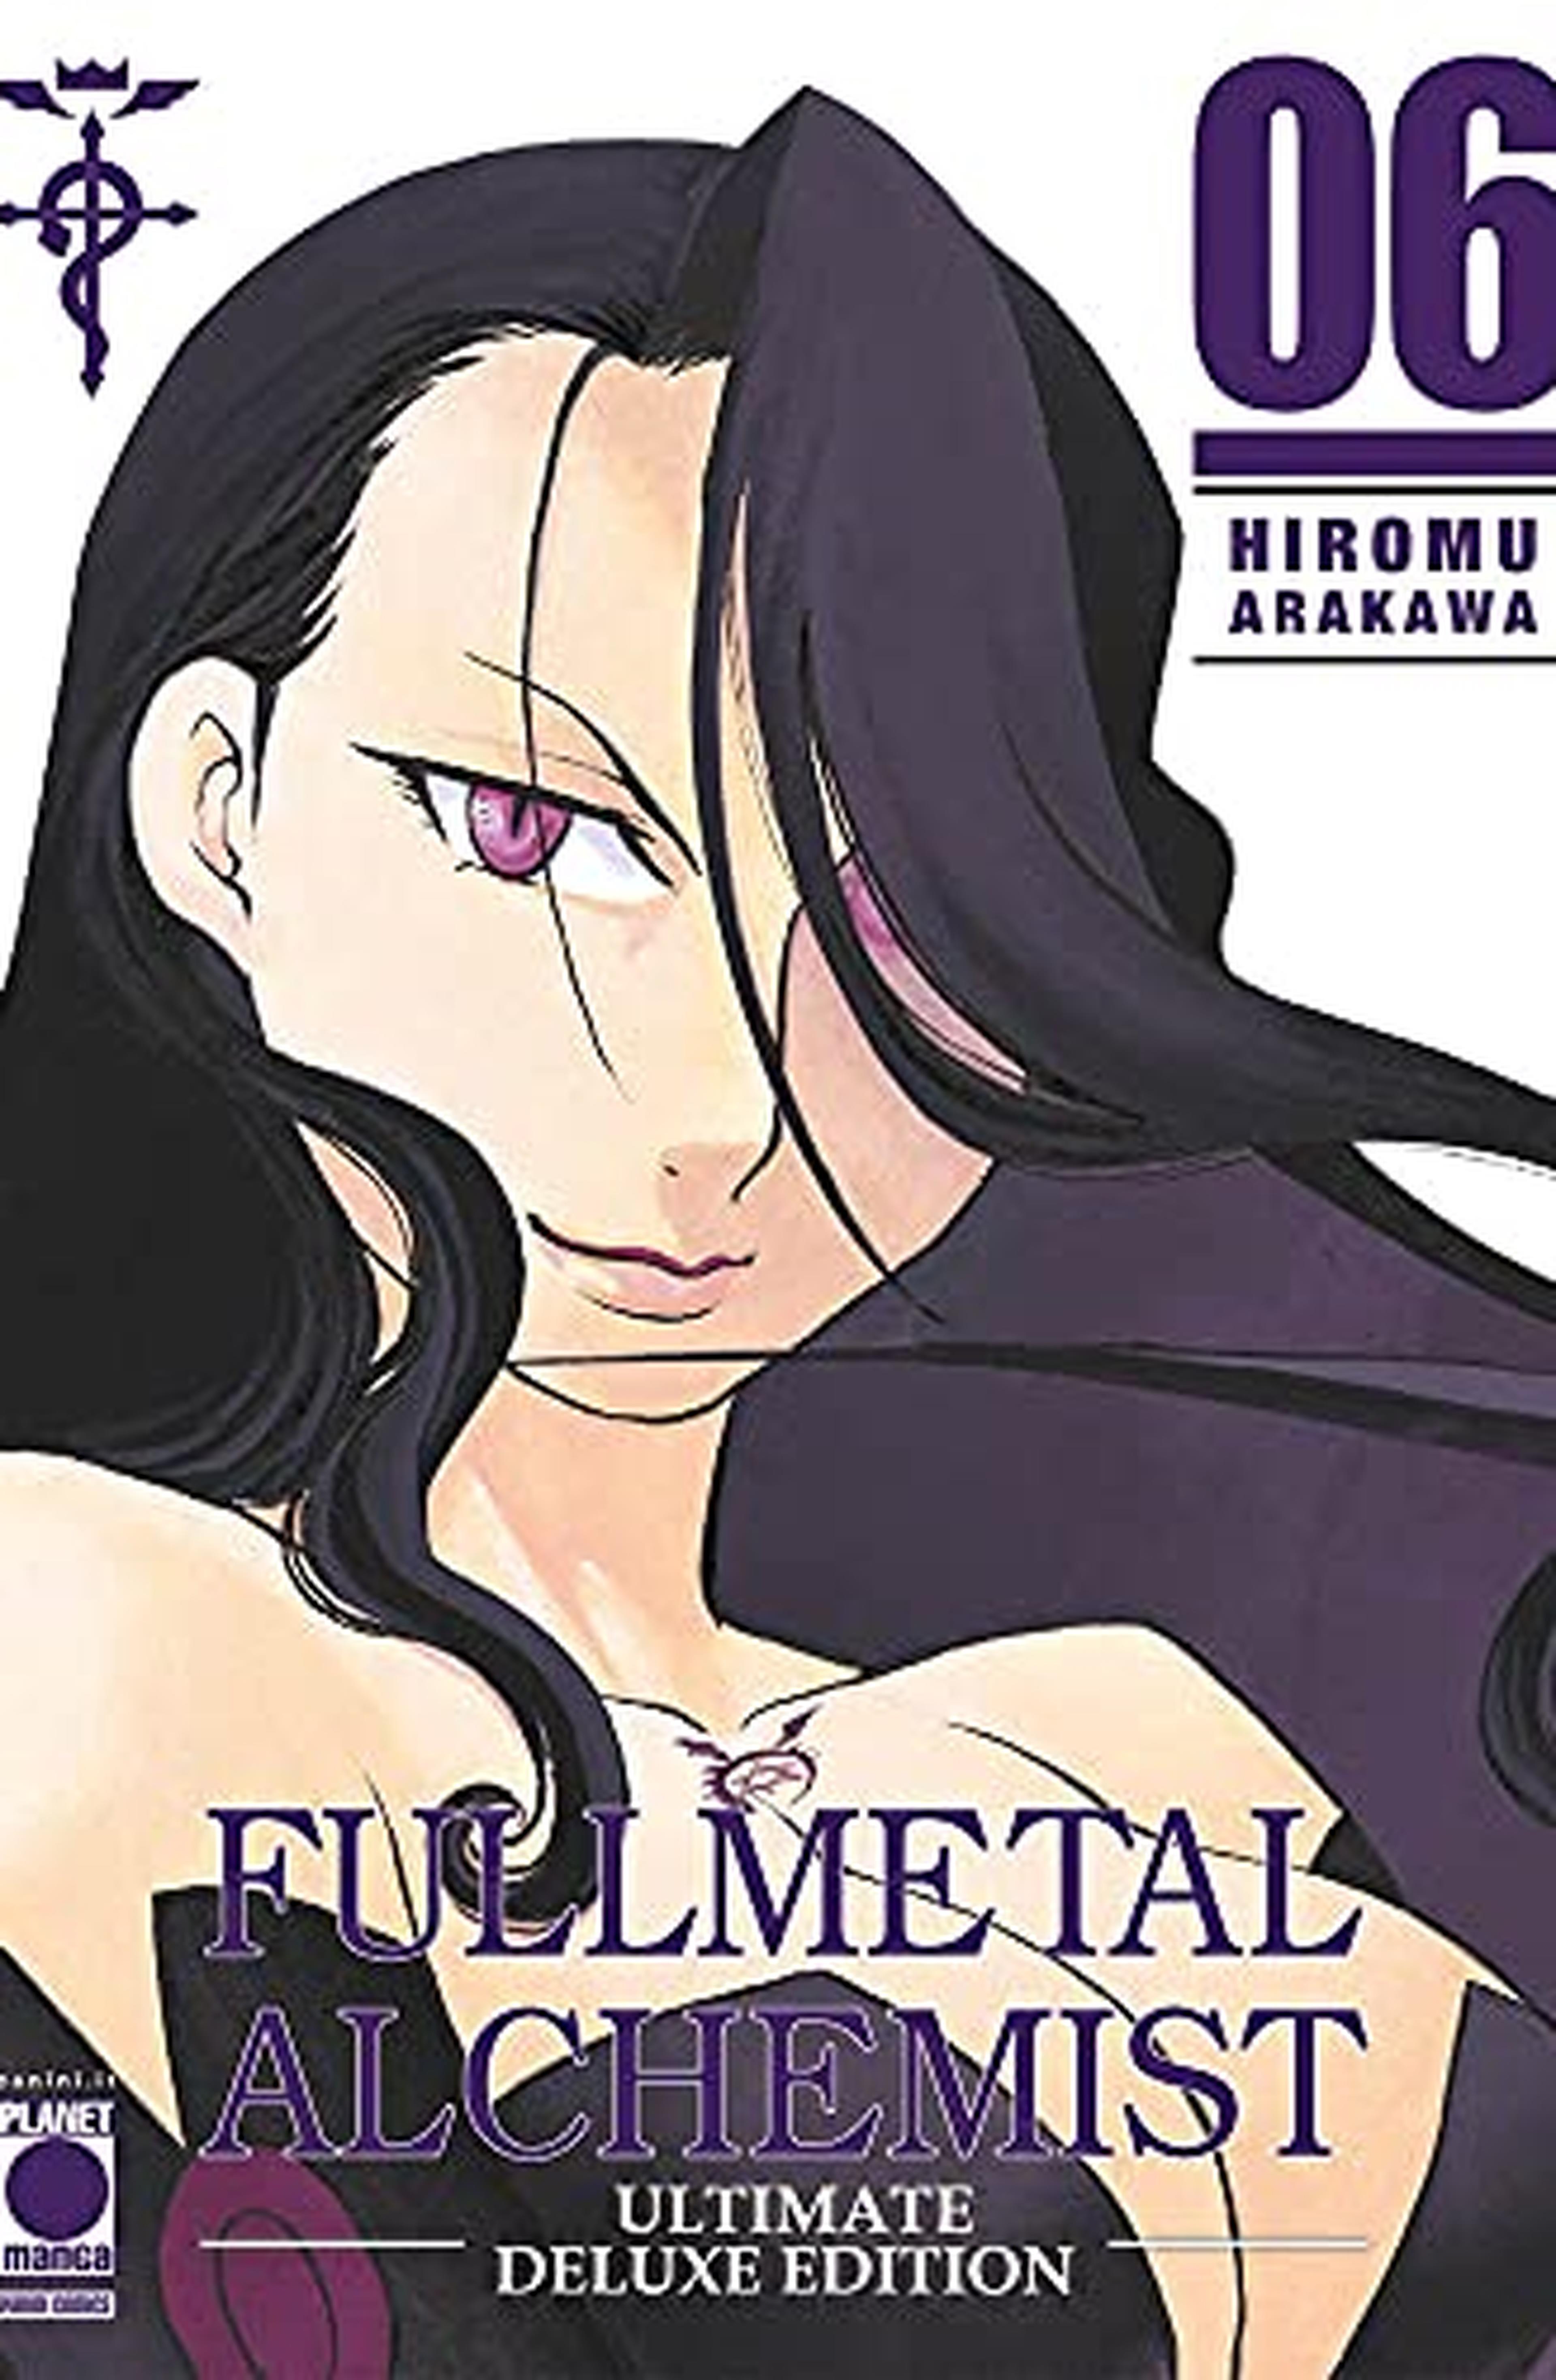 Fullmetal alchemist. Ultimate deluxe edition (Vol. 6)